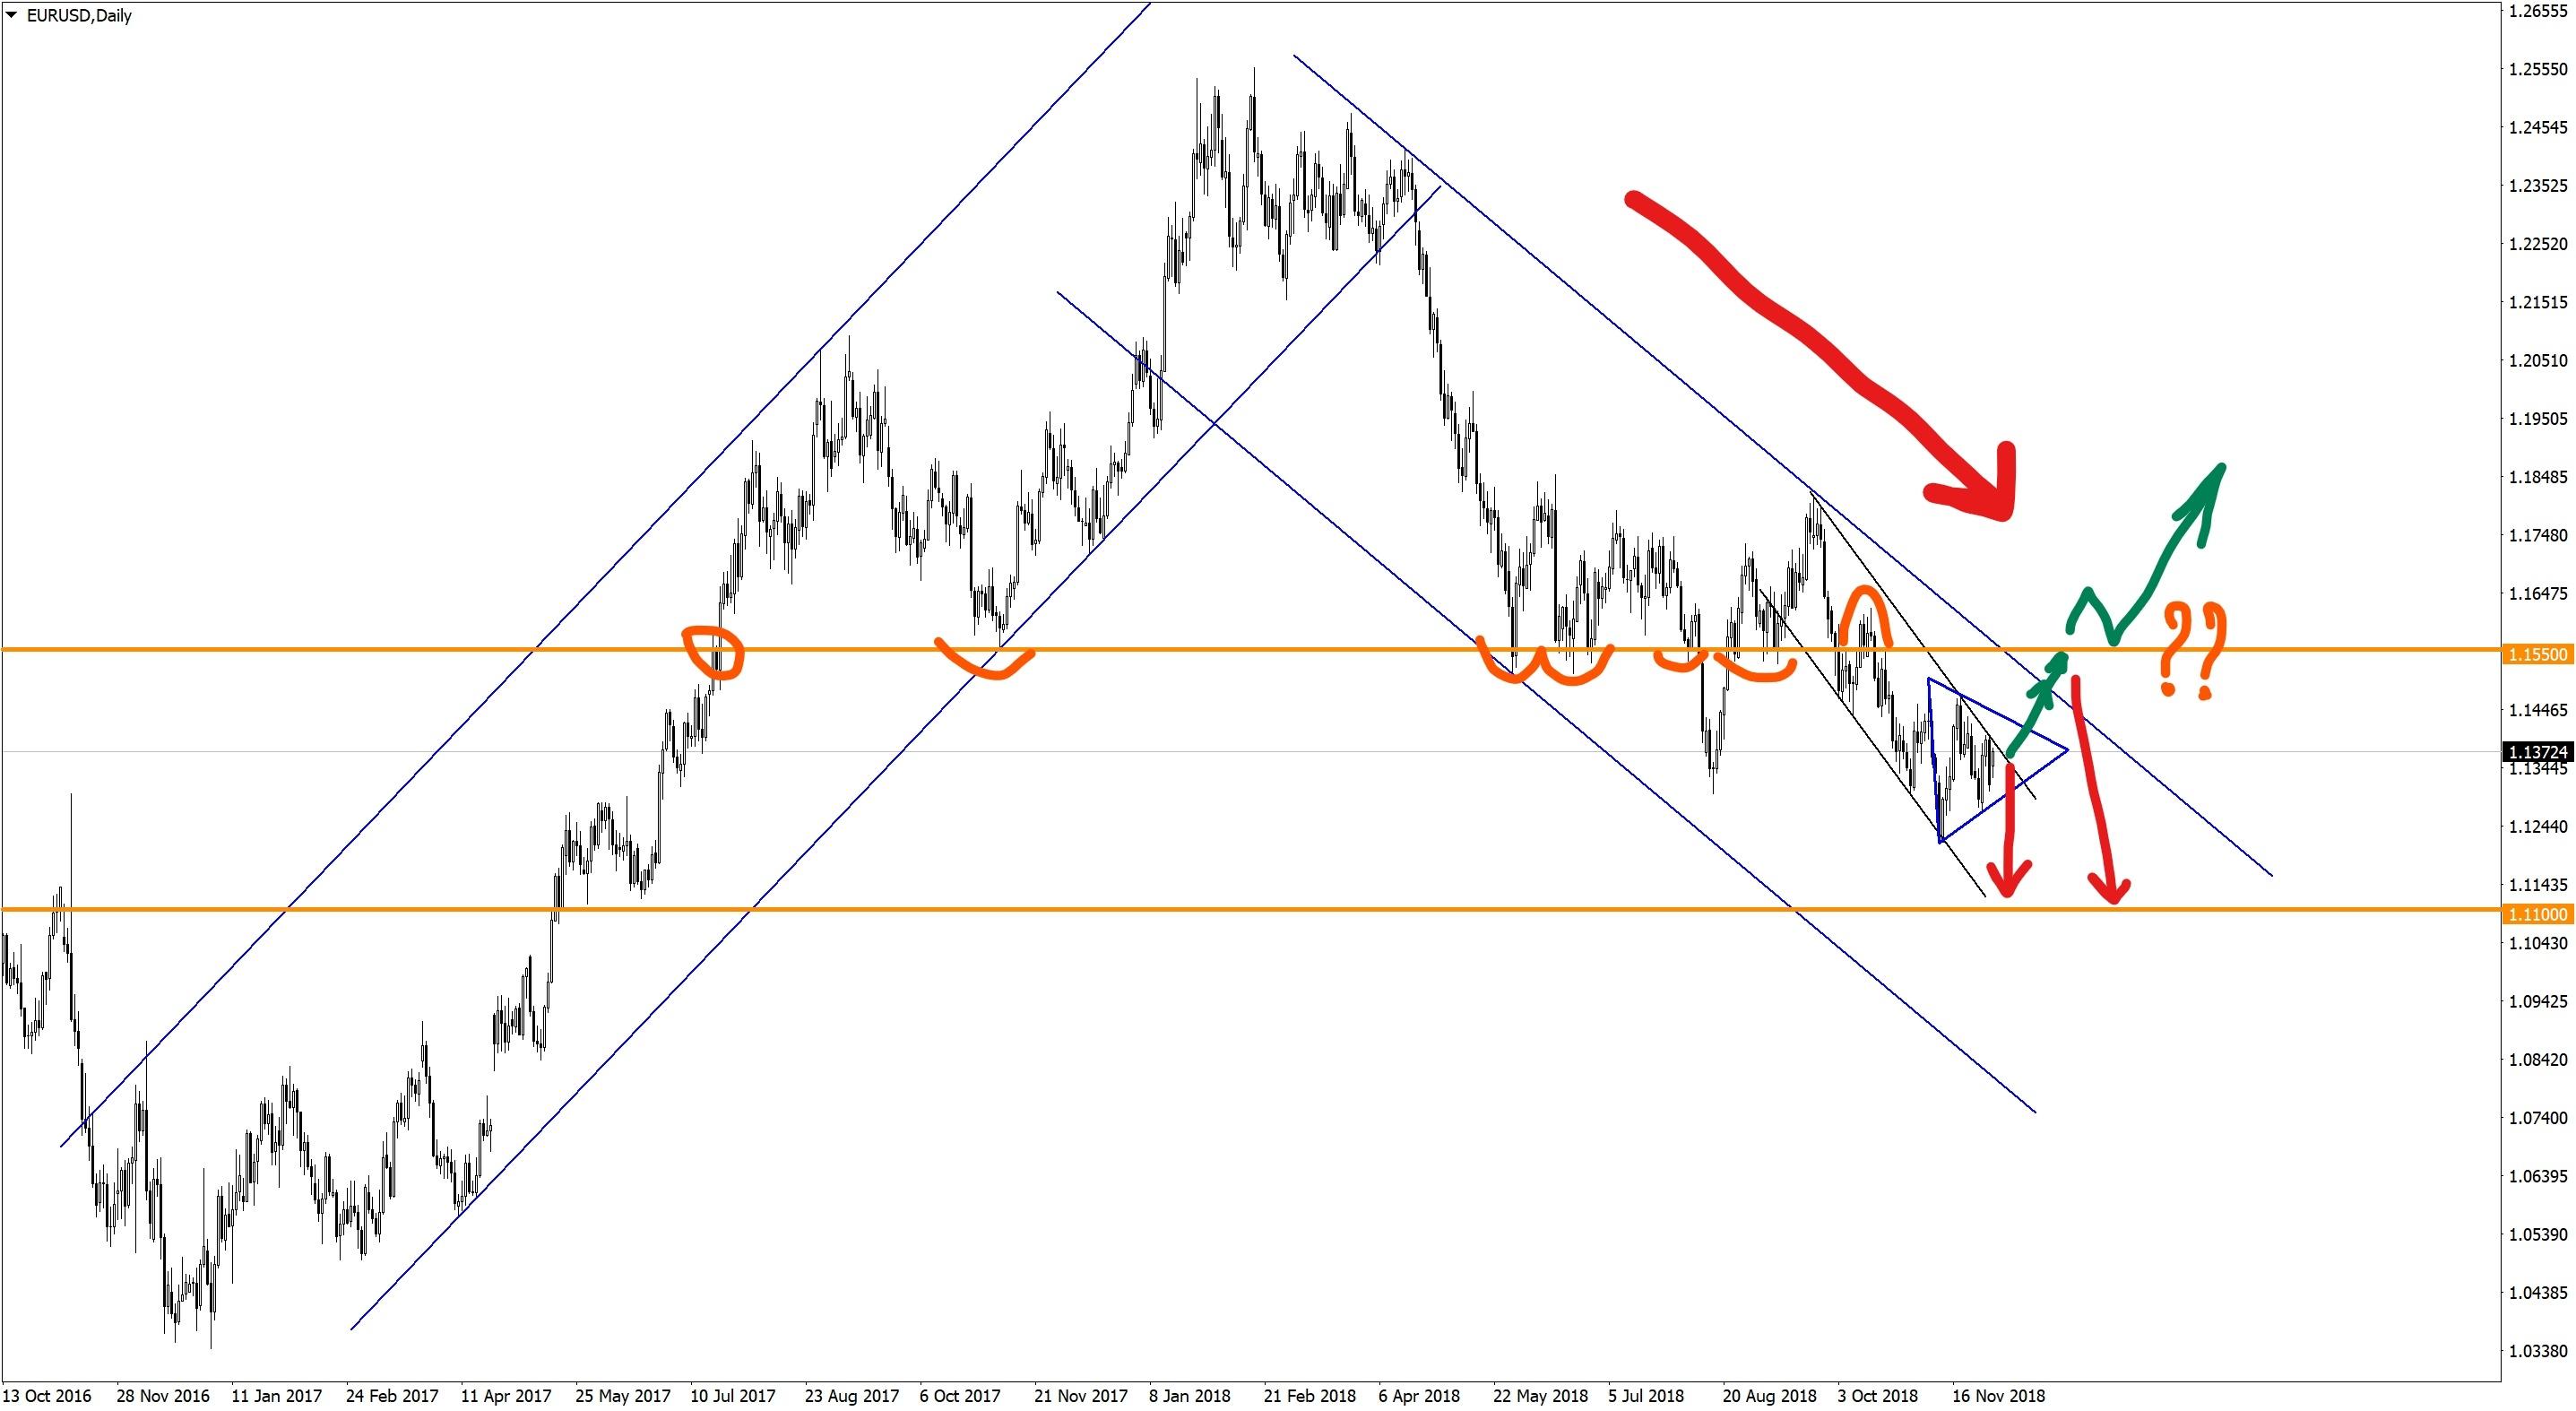 EURUSDDaily-тренд на рост доллара